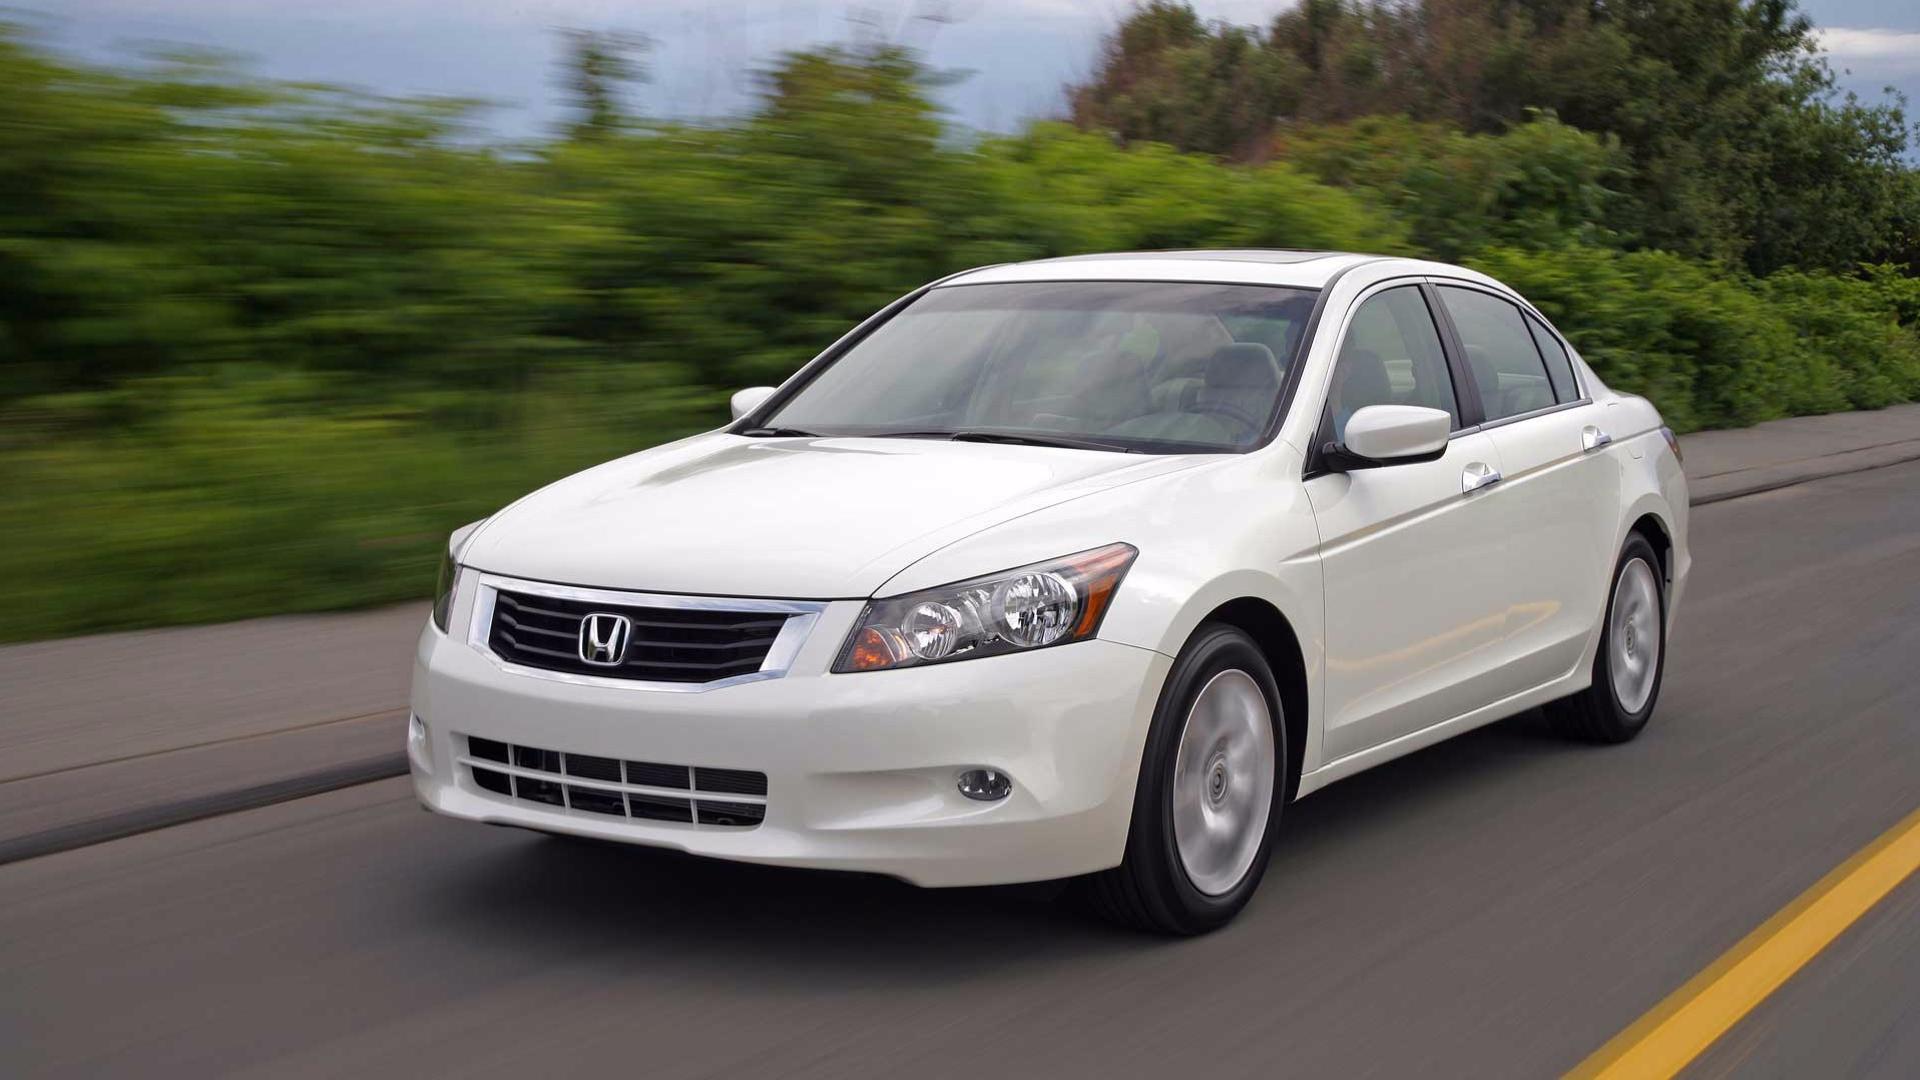 Recalls Honda Com >> Honda Recalls 646 Recalled Cars To Fix Wrongly Installed Airbags